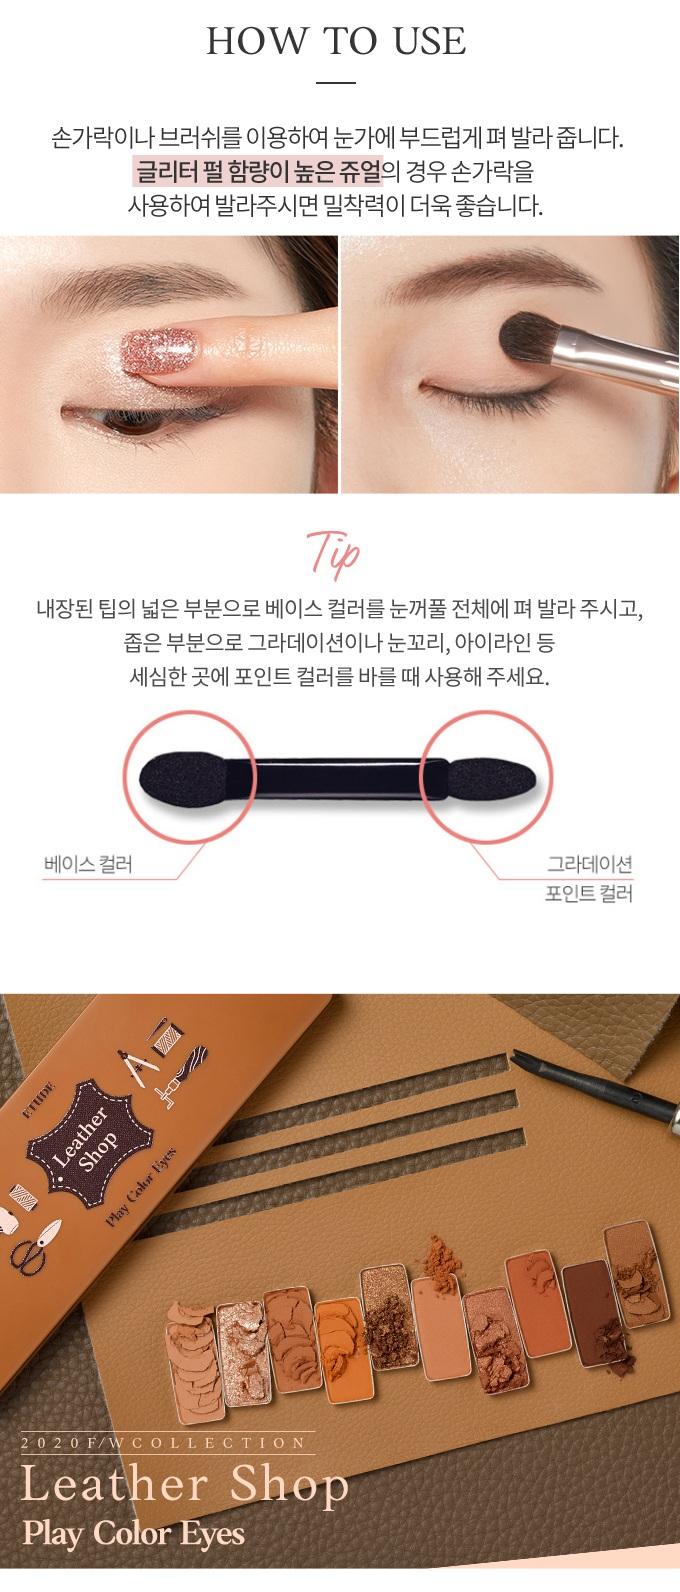 Etude House Play Color Eyes Mini Leather Shop korean cosmetic makeup product online shop malaysia macau thailand3